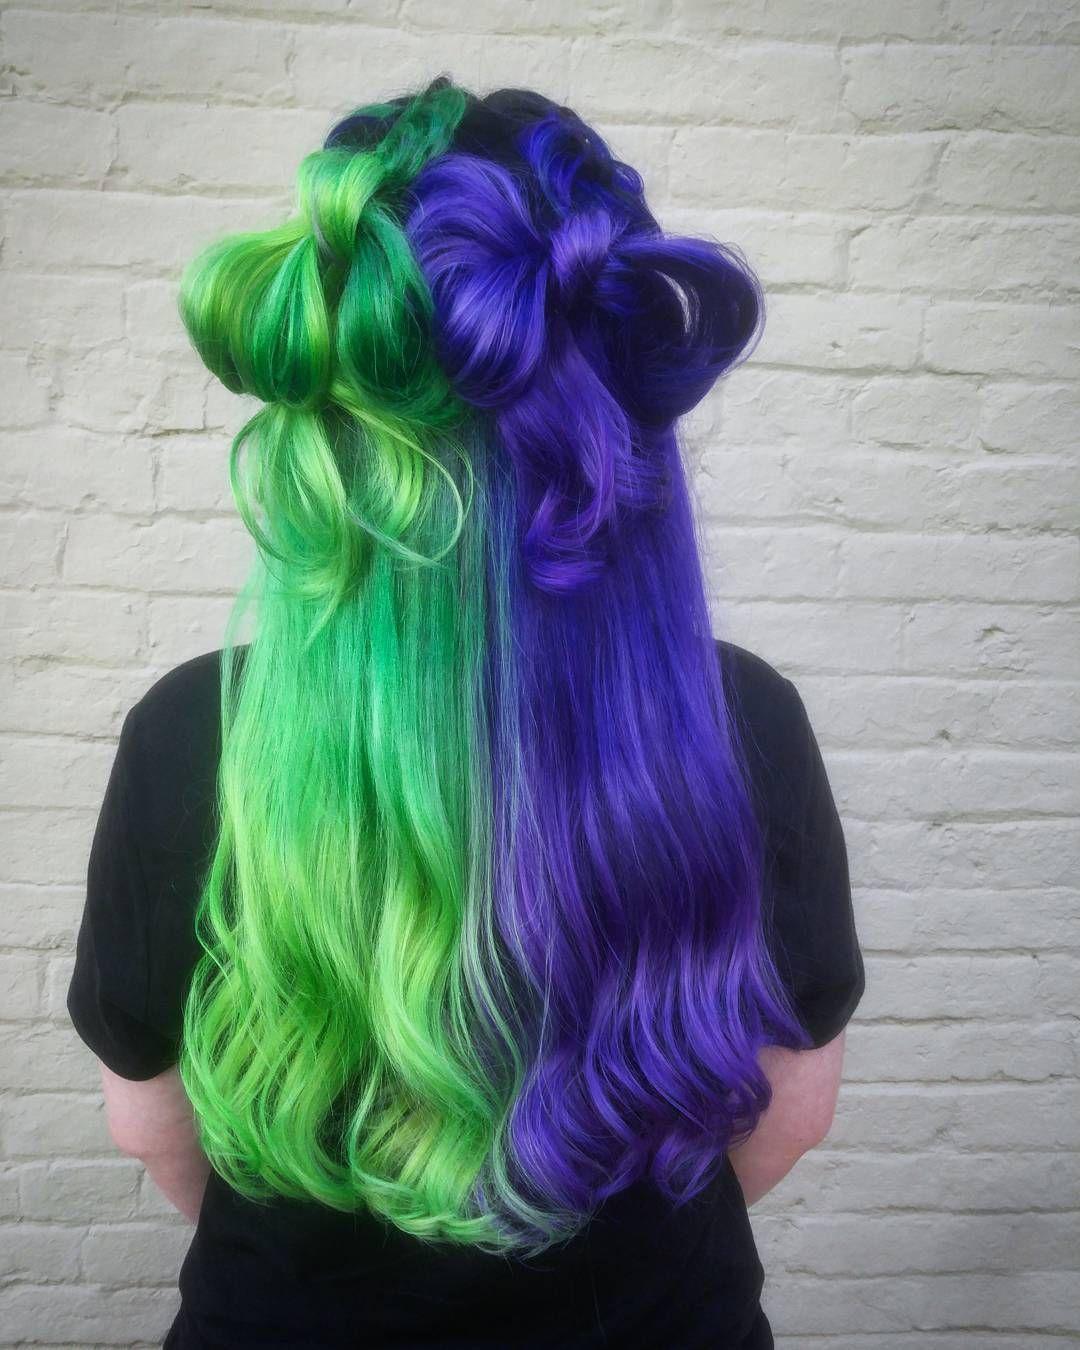 Haircolorideas Hashtag Instagram Posts Videos Stories On